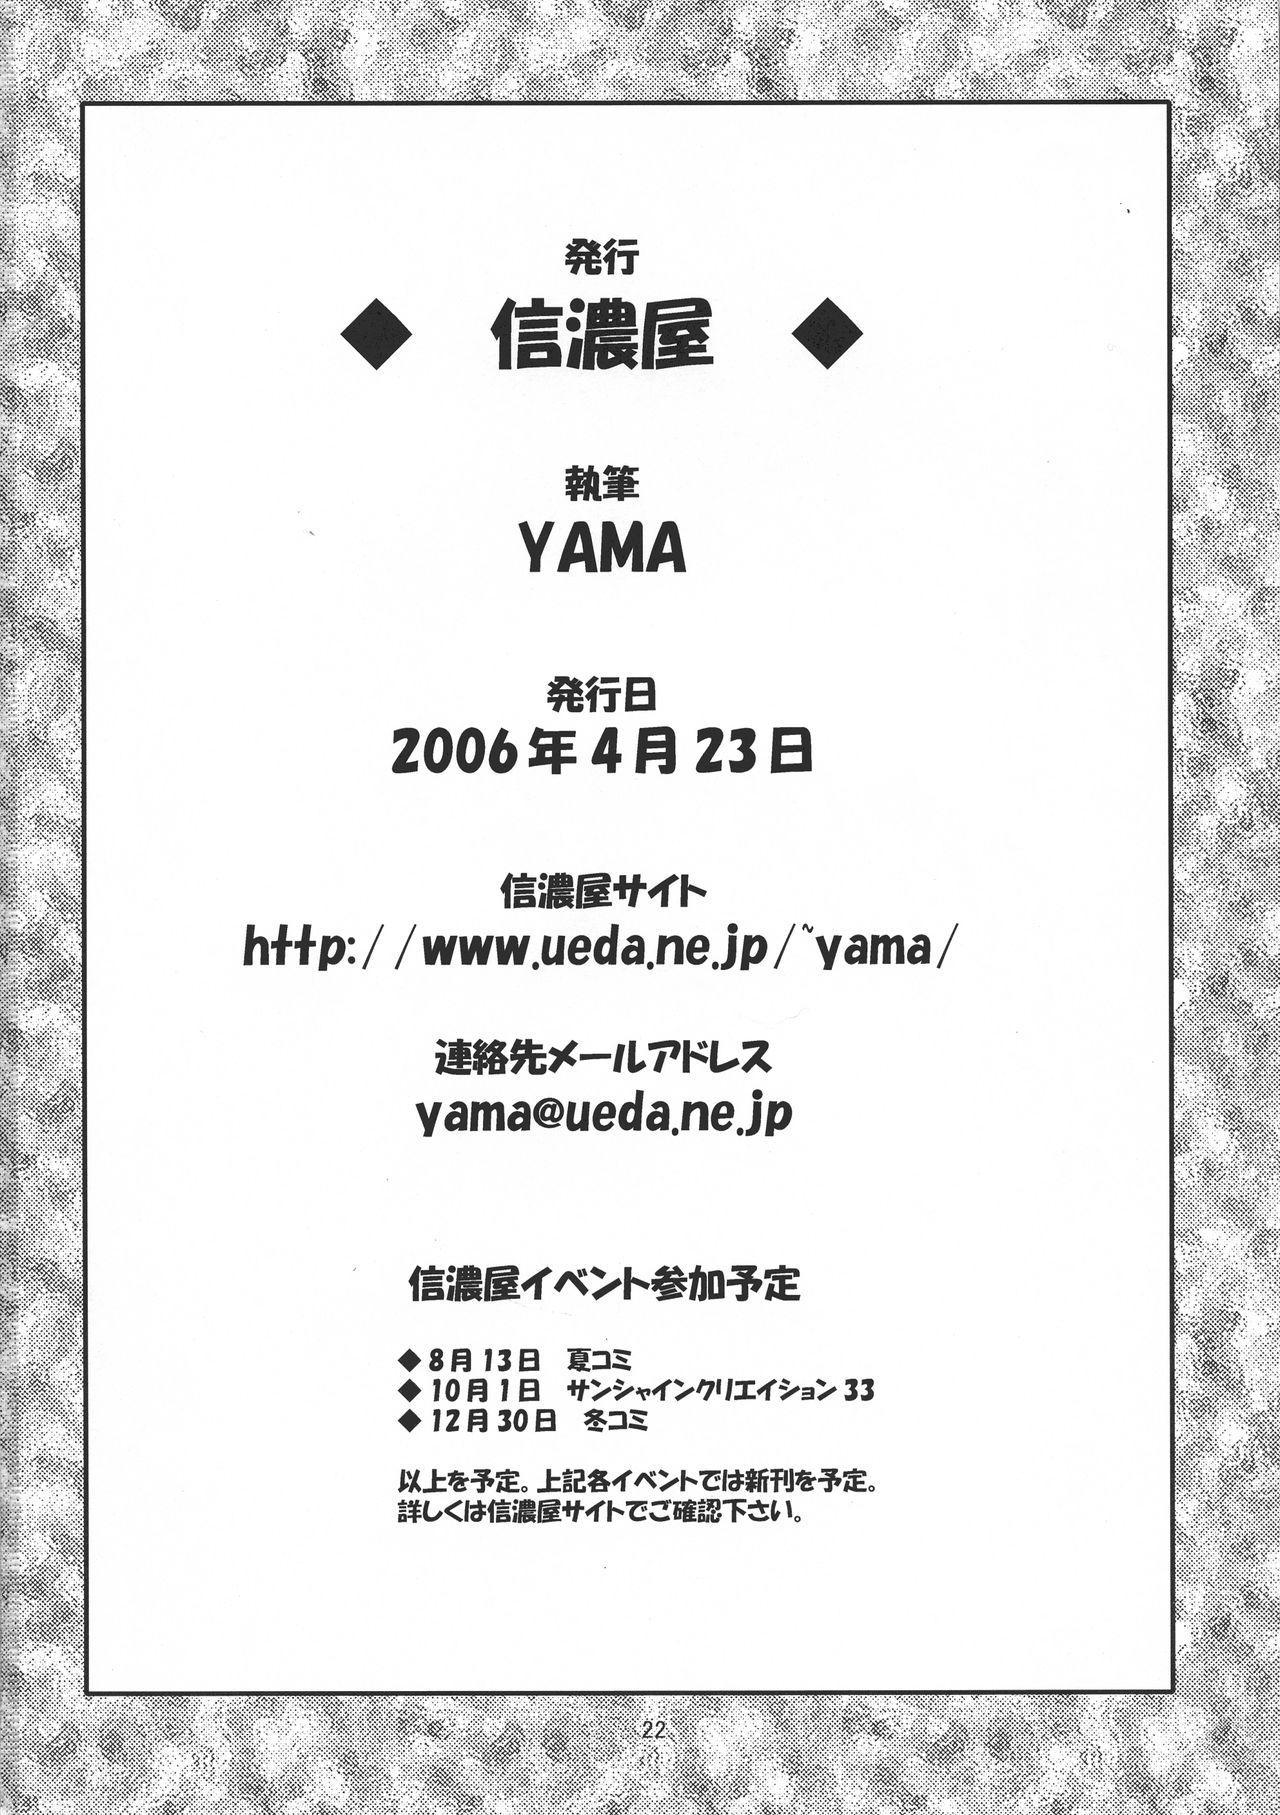 V-TIC 35 21